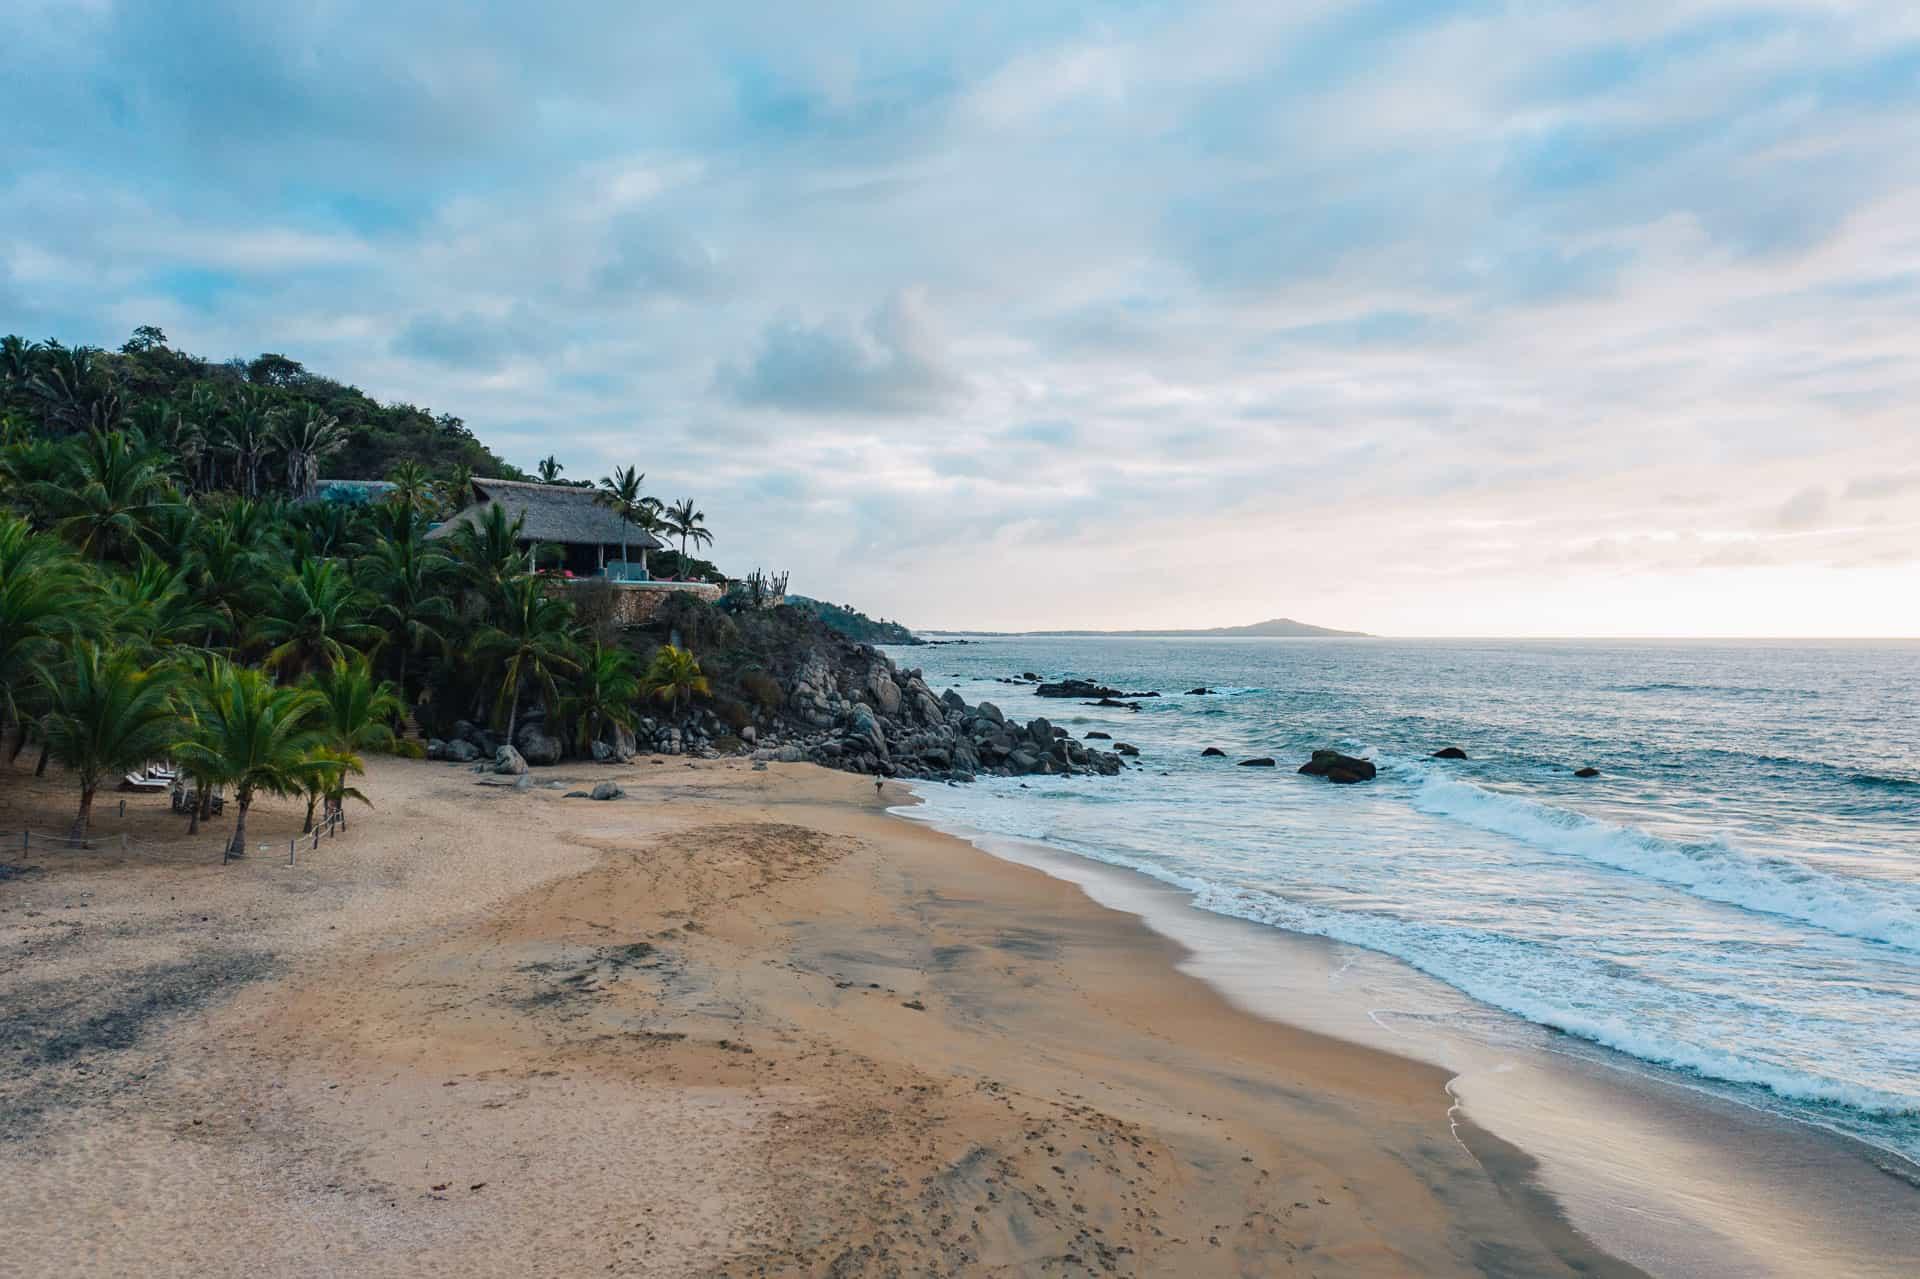 playa carracitos, things to do in sayulita, sayulita mexico, what to do in sayulita, sayulita